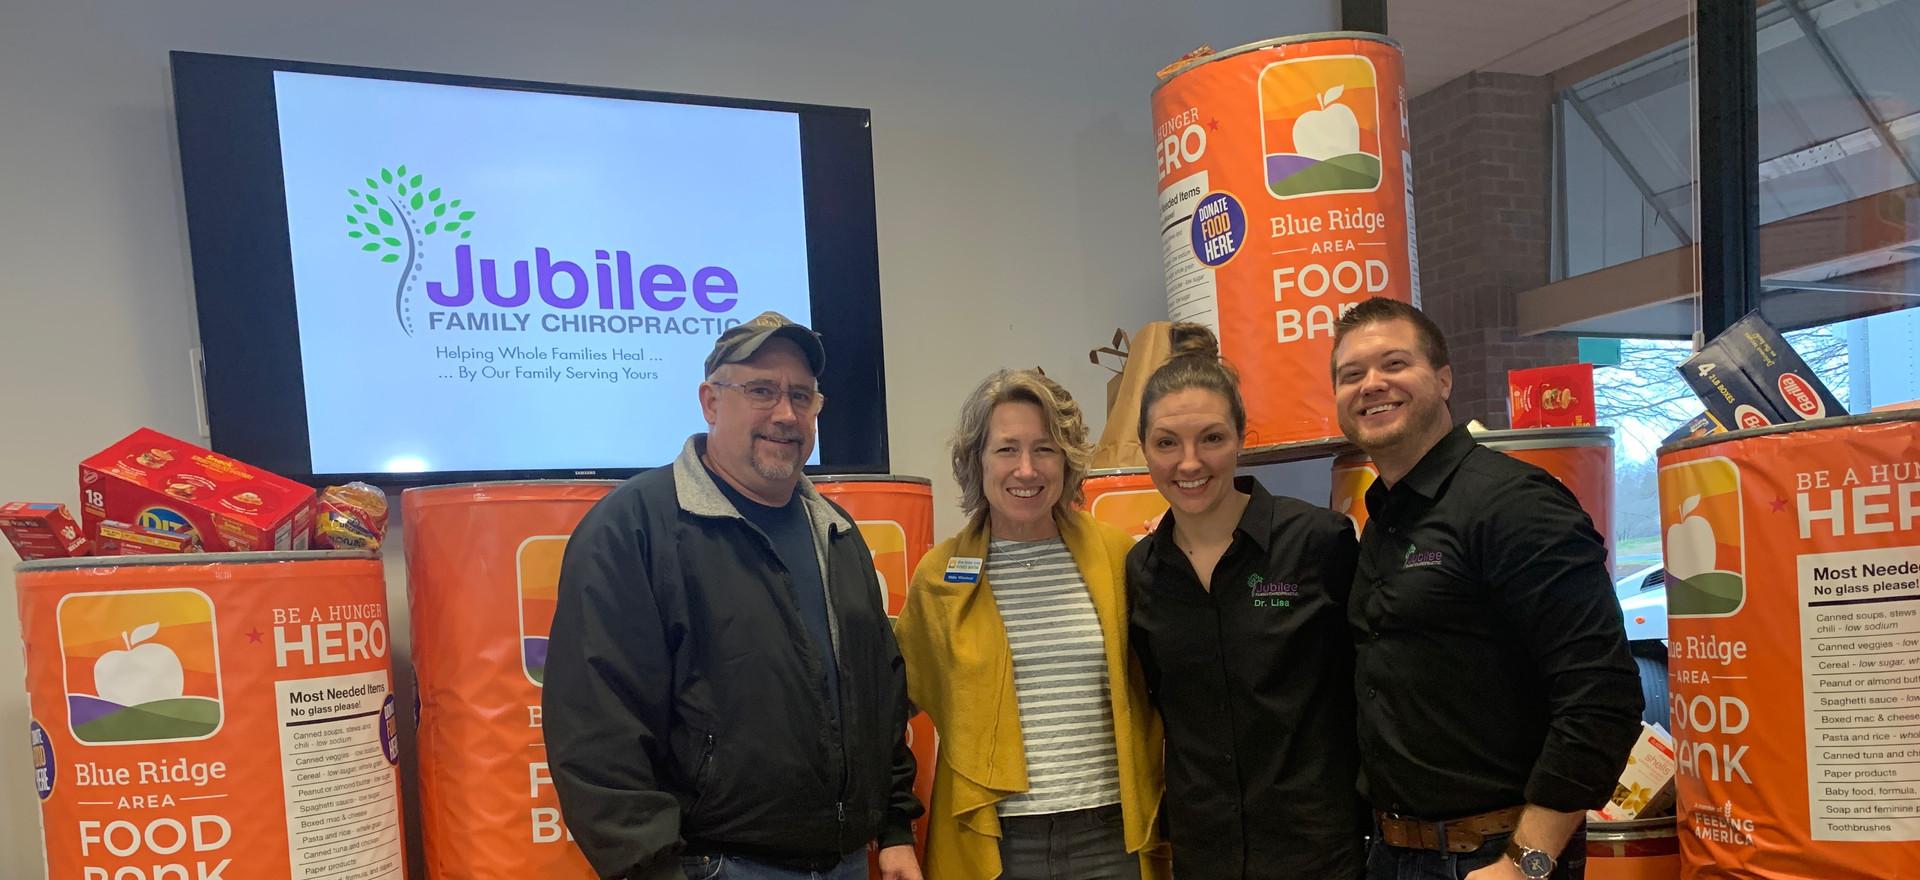 Jubilee Family Chiropractic 2020 Blue Ridge Food Drive. 045